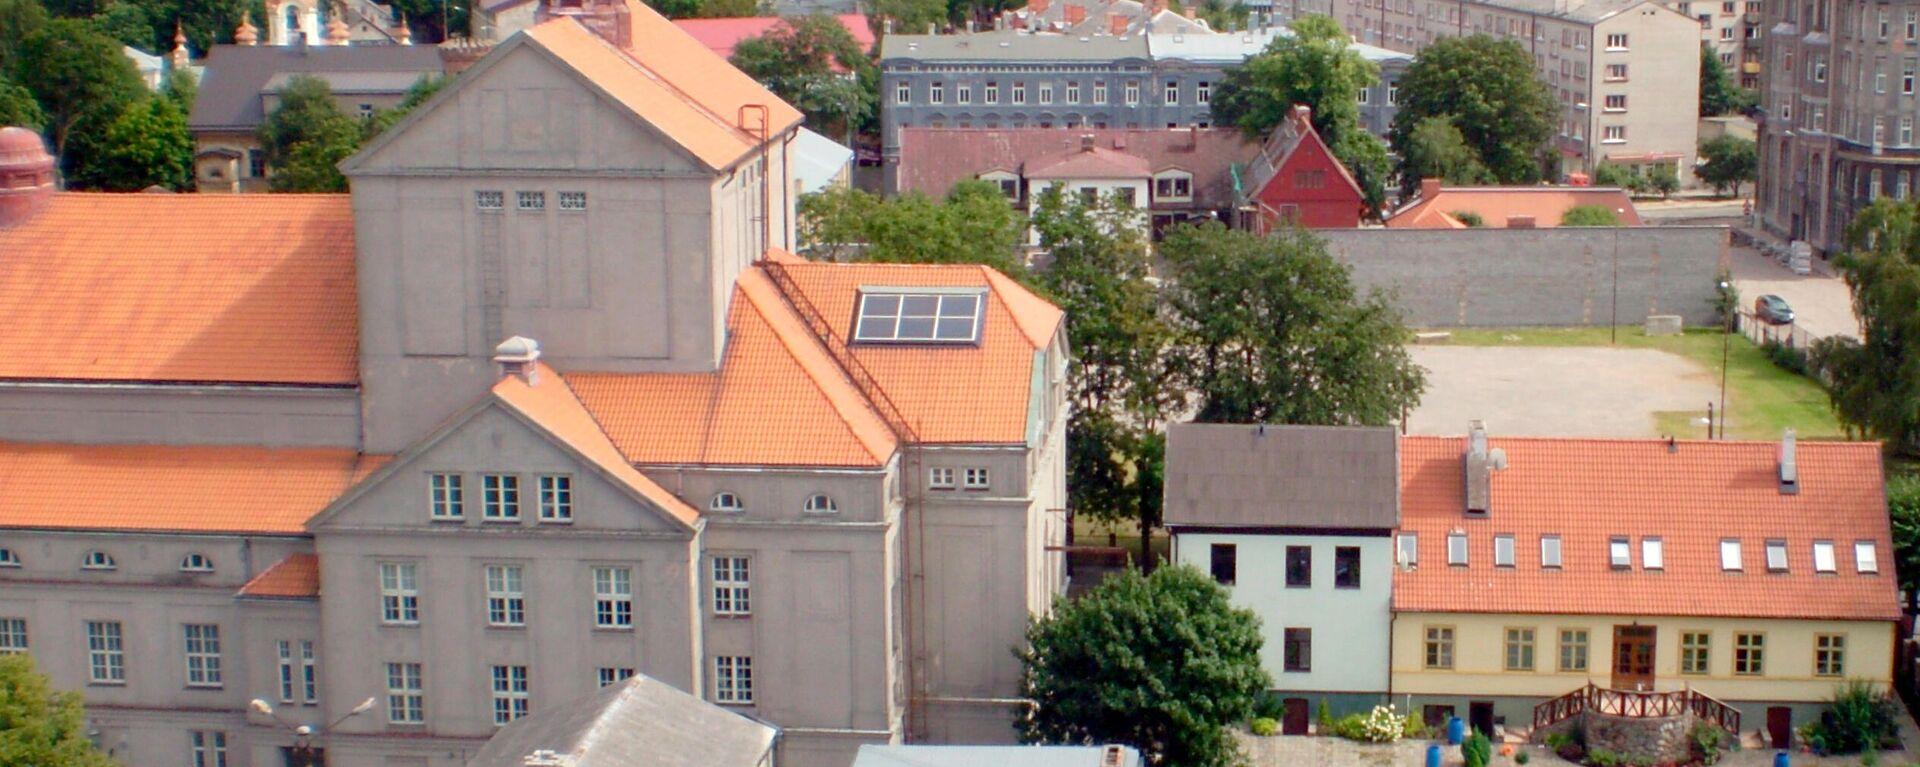 Лиепайский театр - Sputnik Латвия, 1920, 28.07.2021